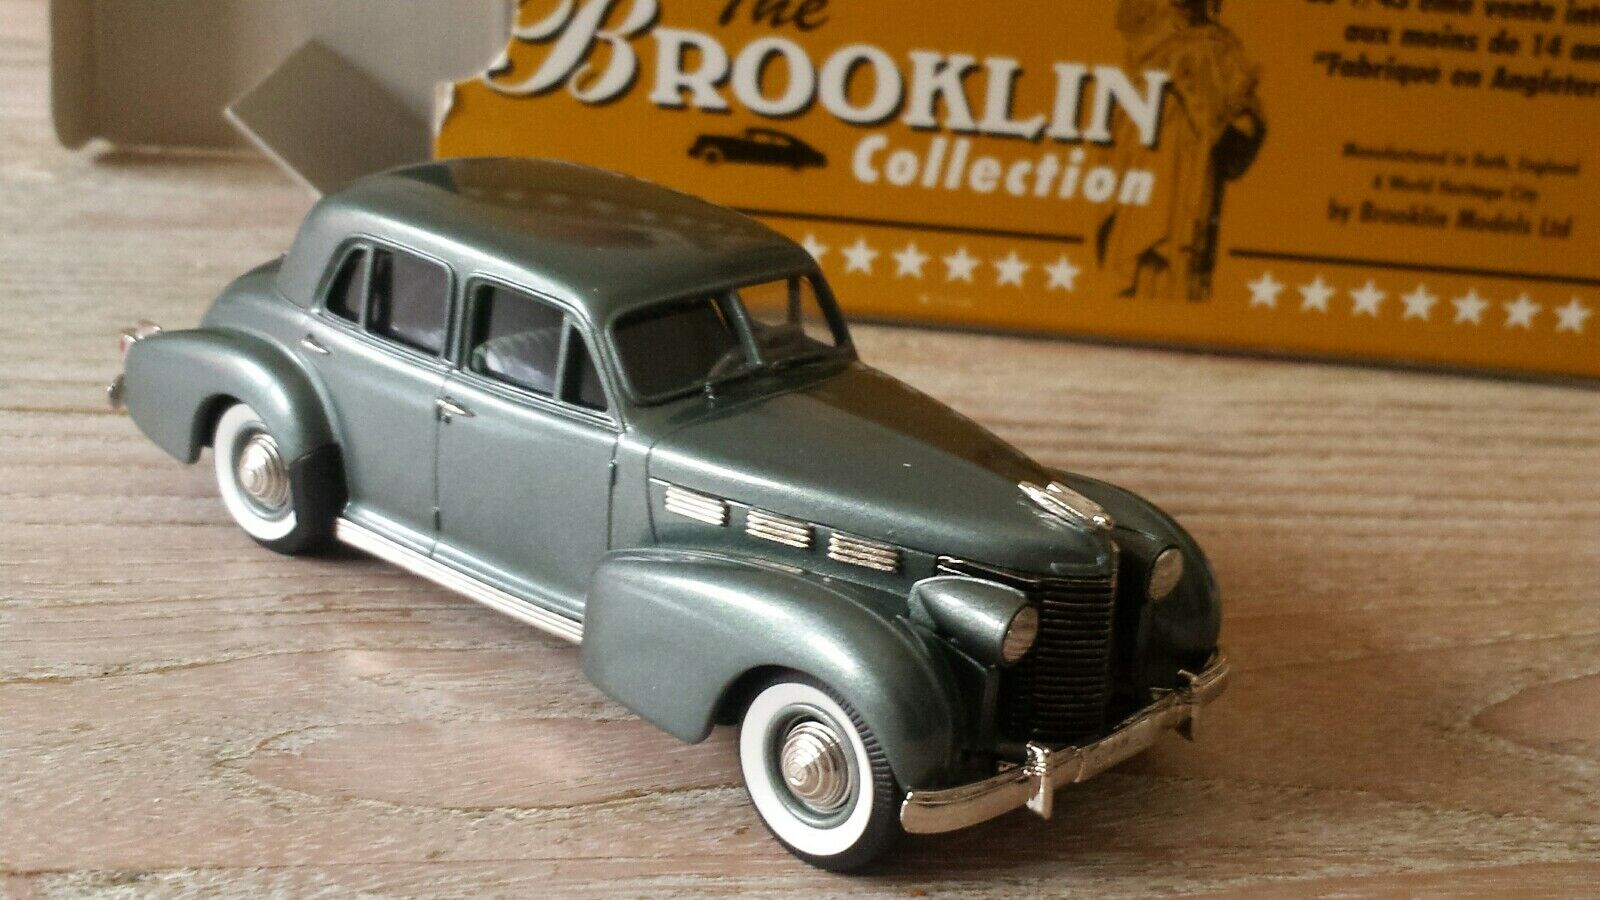 Brooklin models illac 60 Special 1938  BRK 86 1 43